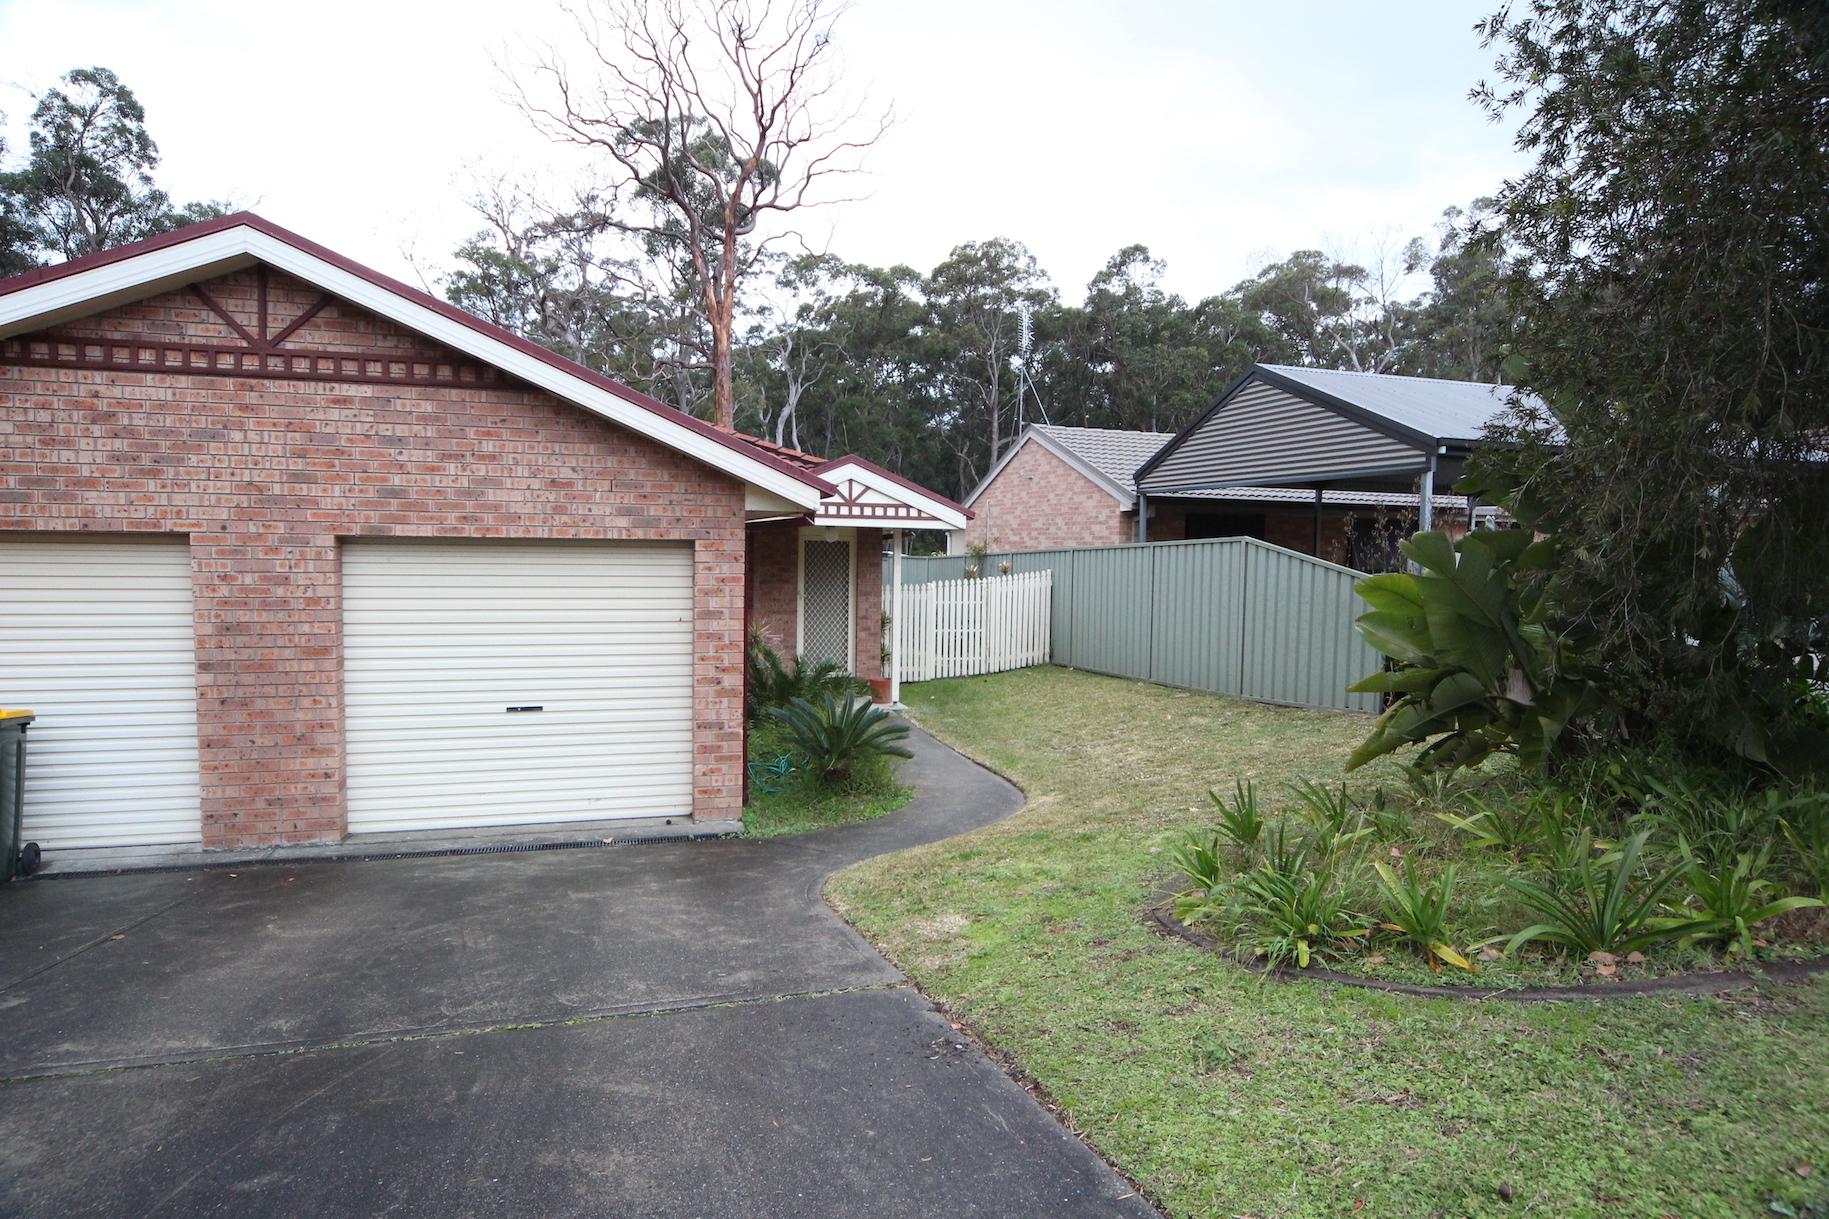 2/19 Barringum Close, MEDOWIE, NSW, 2318 - Image